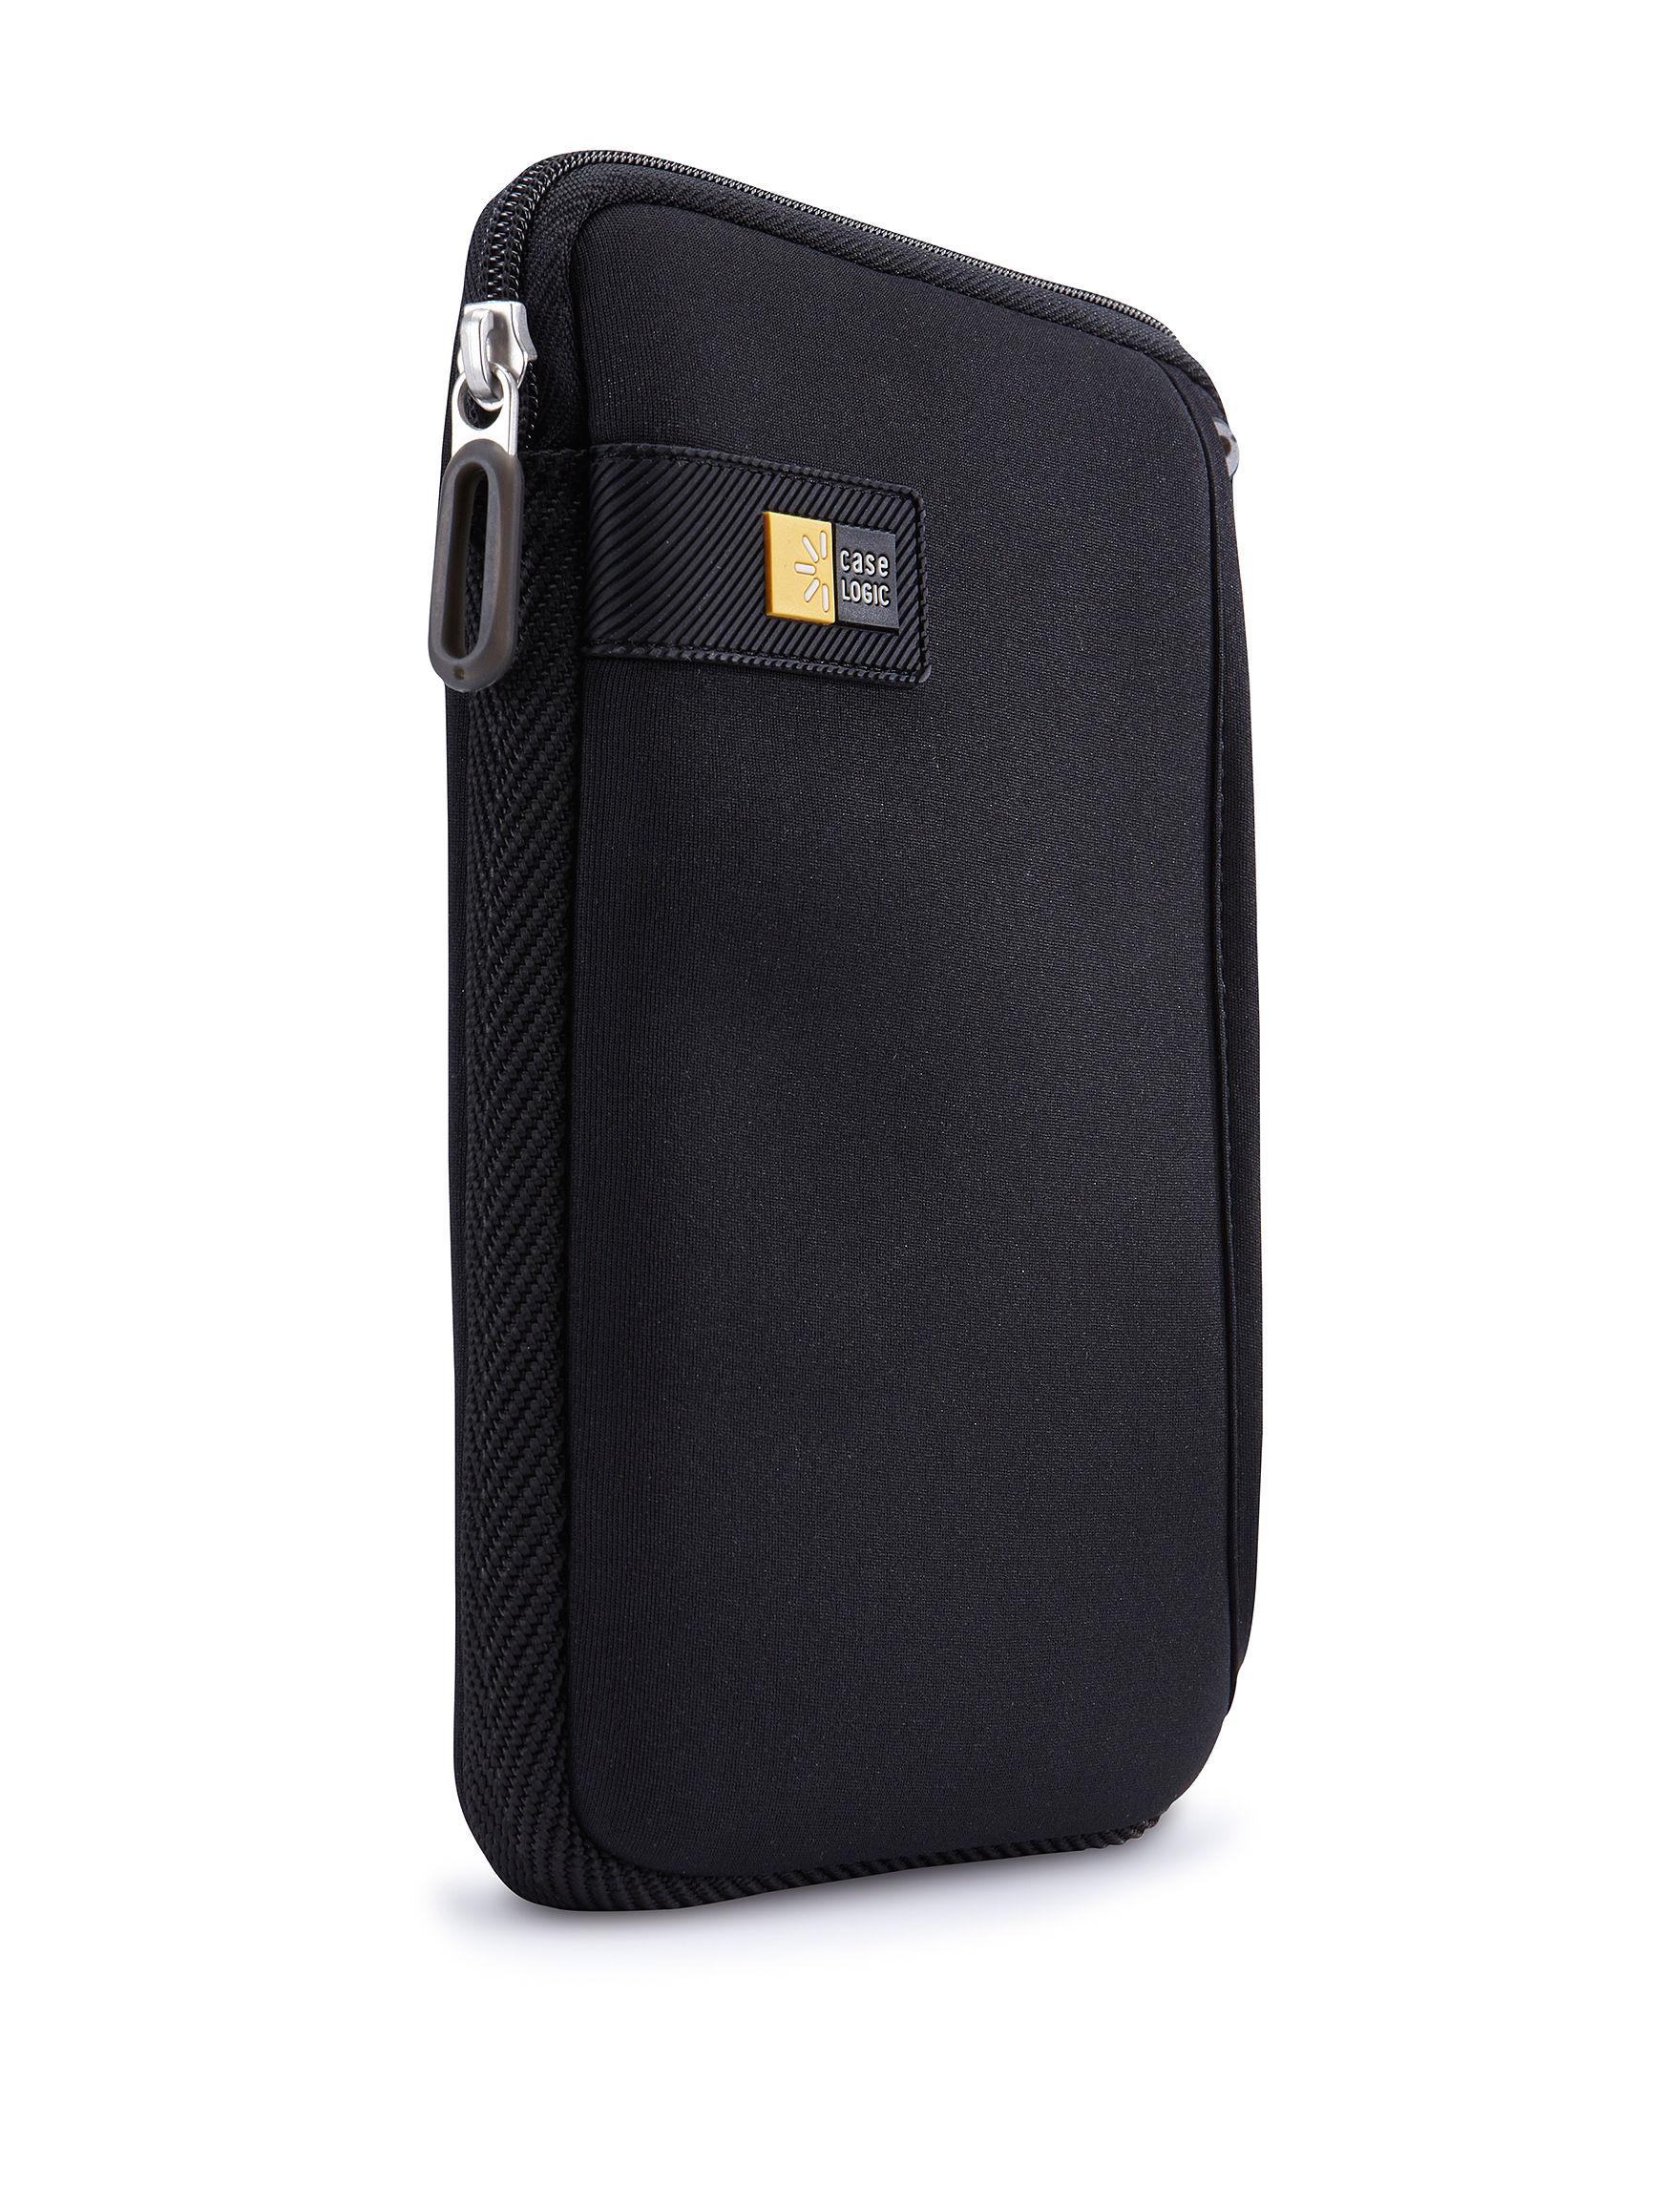 Case Logic Black Cases & Covers Tech Accessories